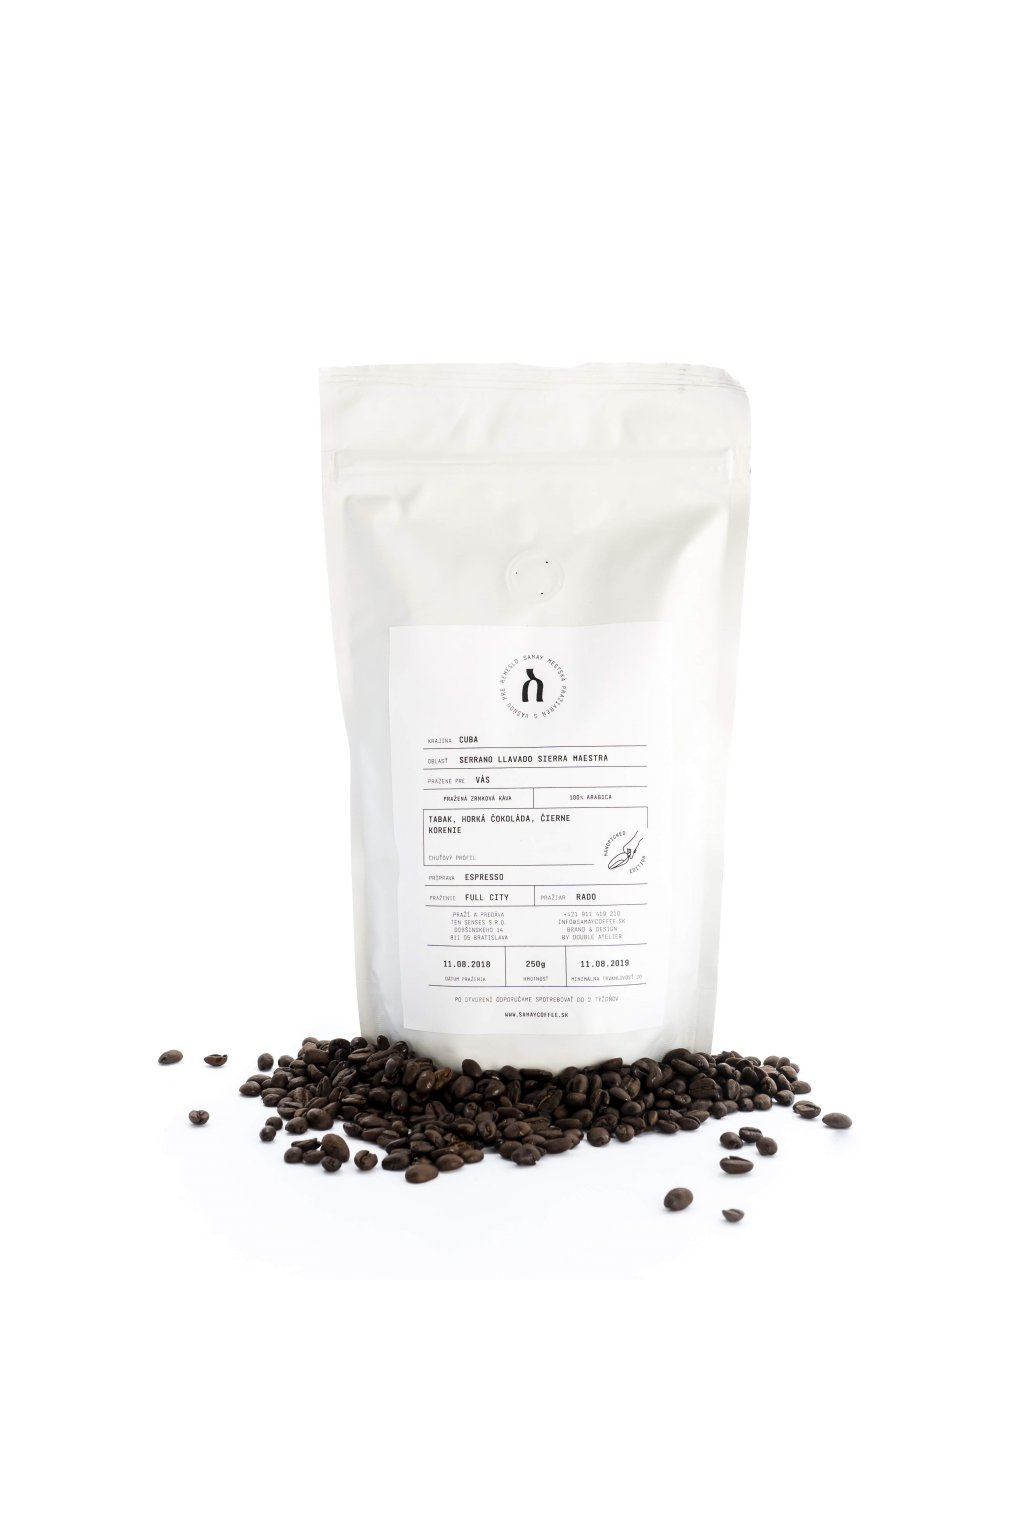 Samay Coffee Cuba Serano Llavado, 250g